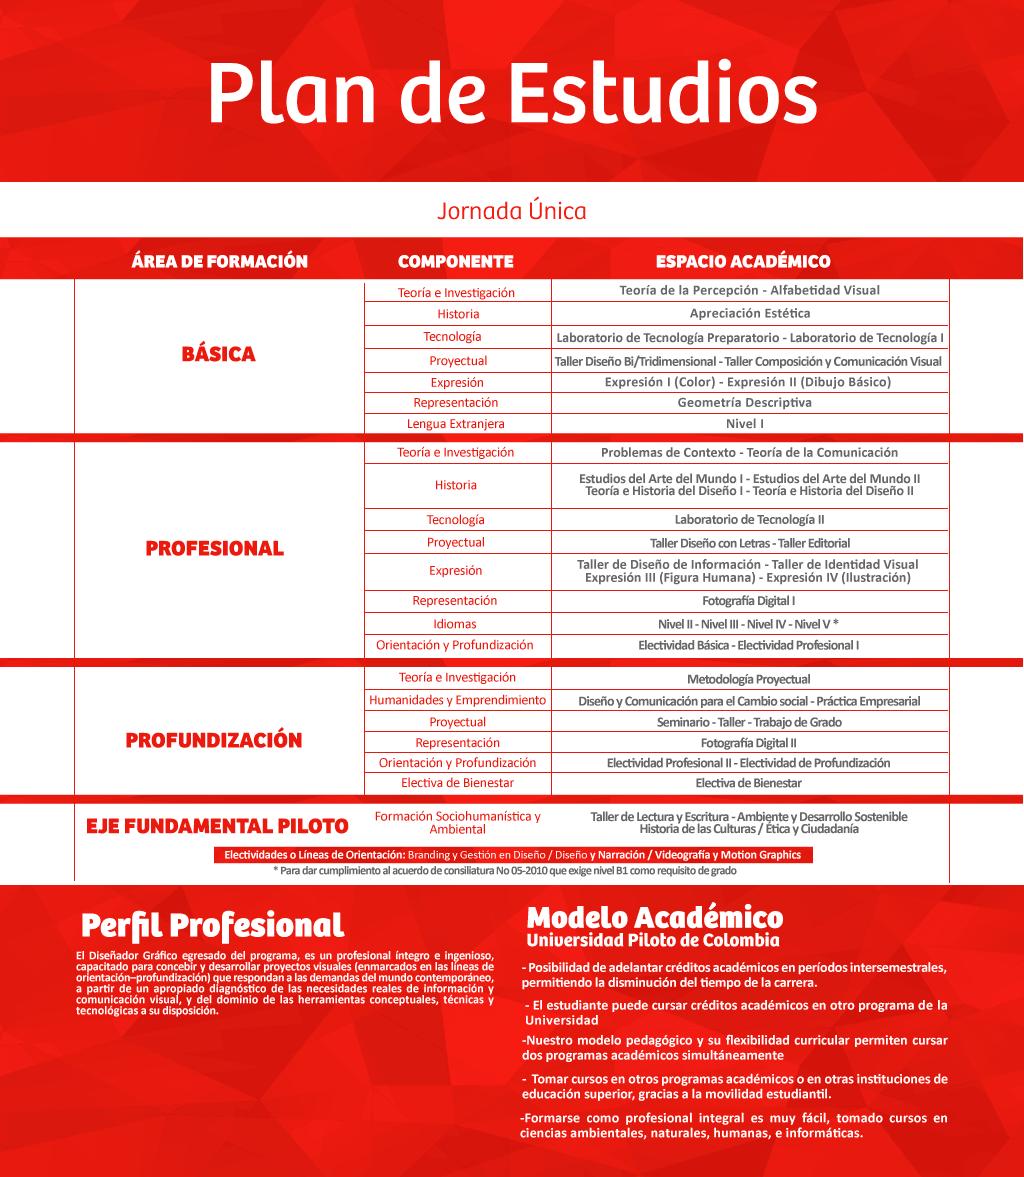 Universidad piloto de colombia dise o gr fico for Diseno grafico universidades